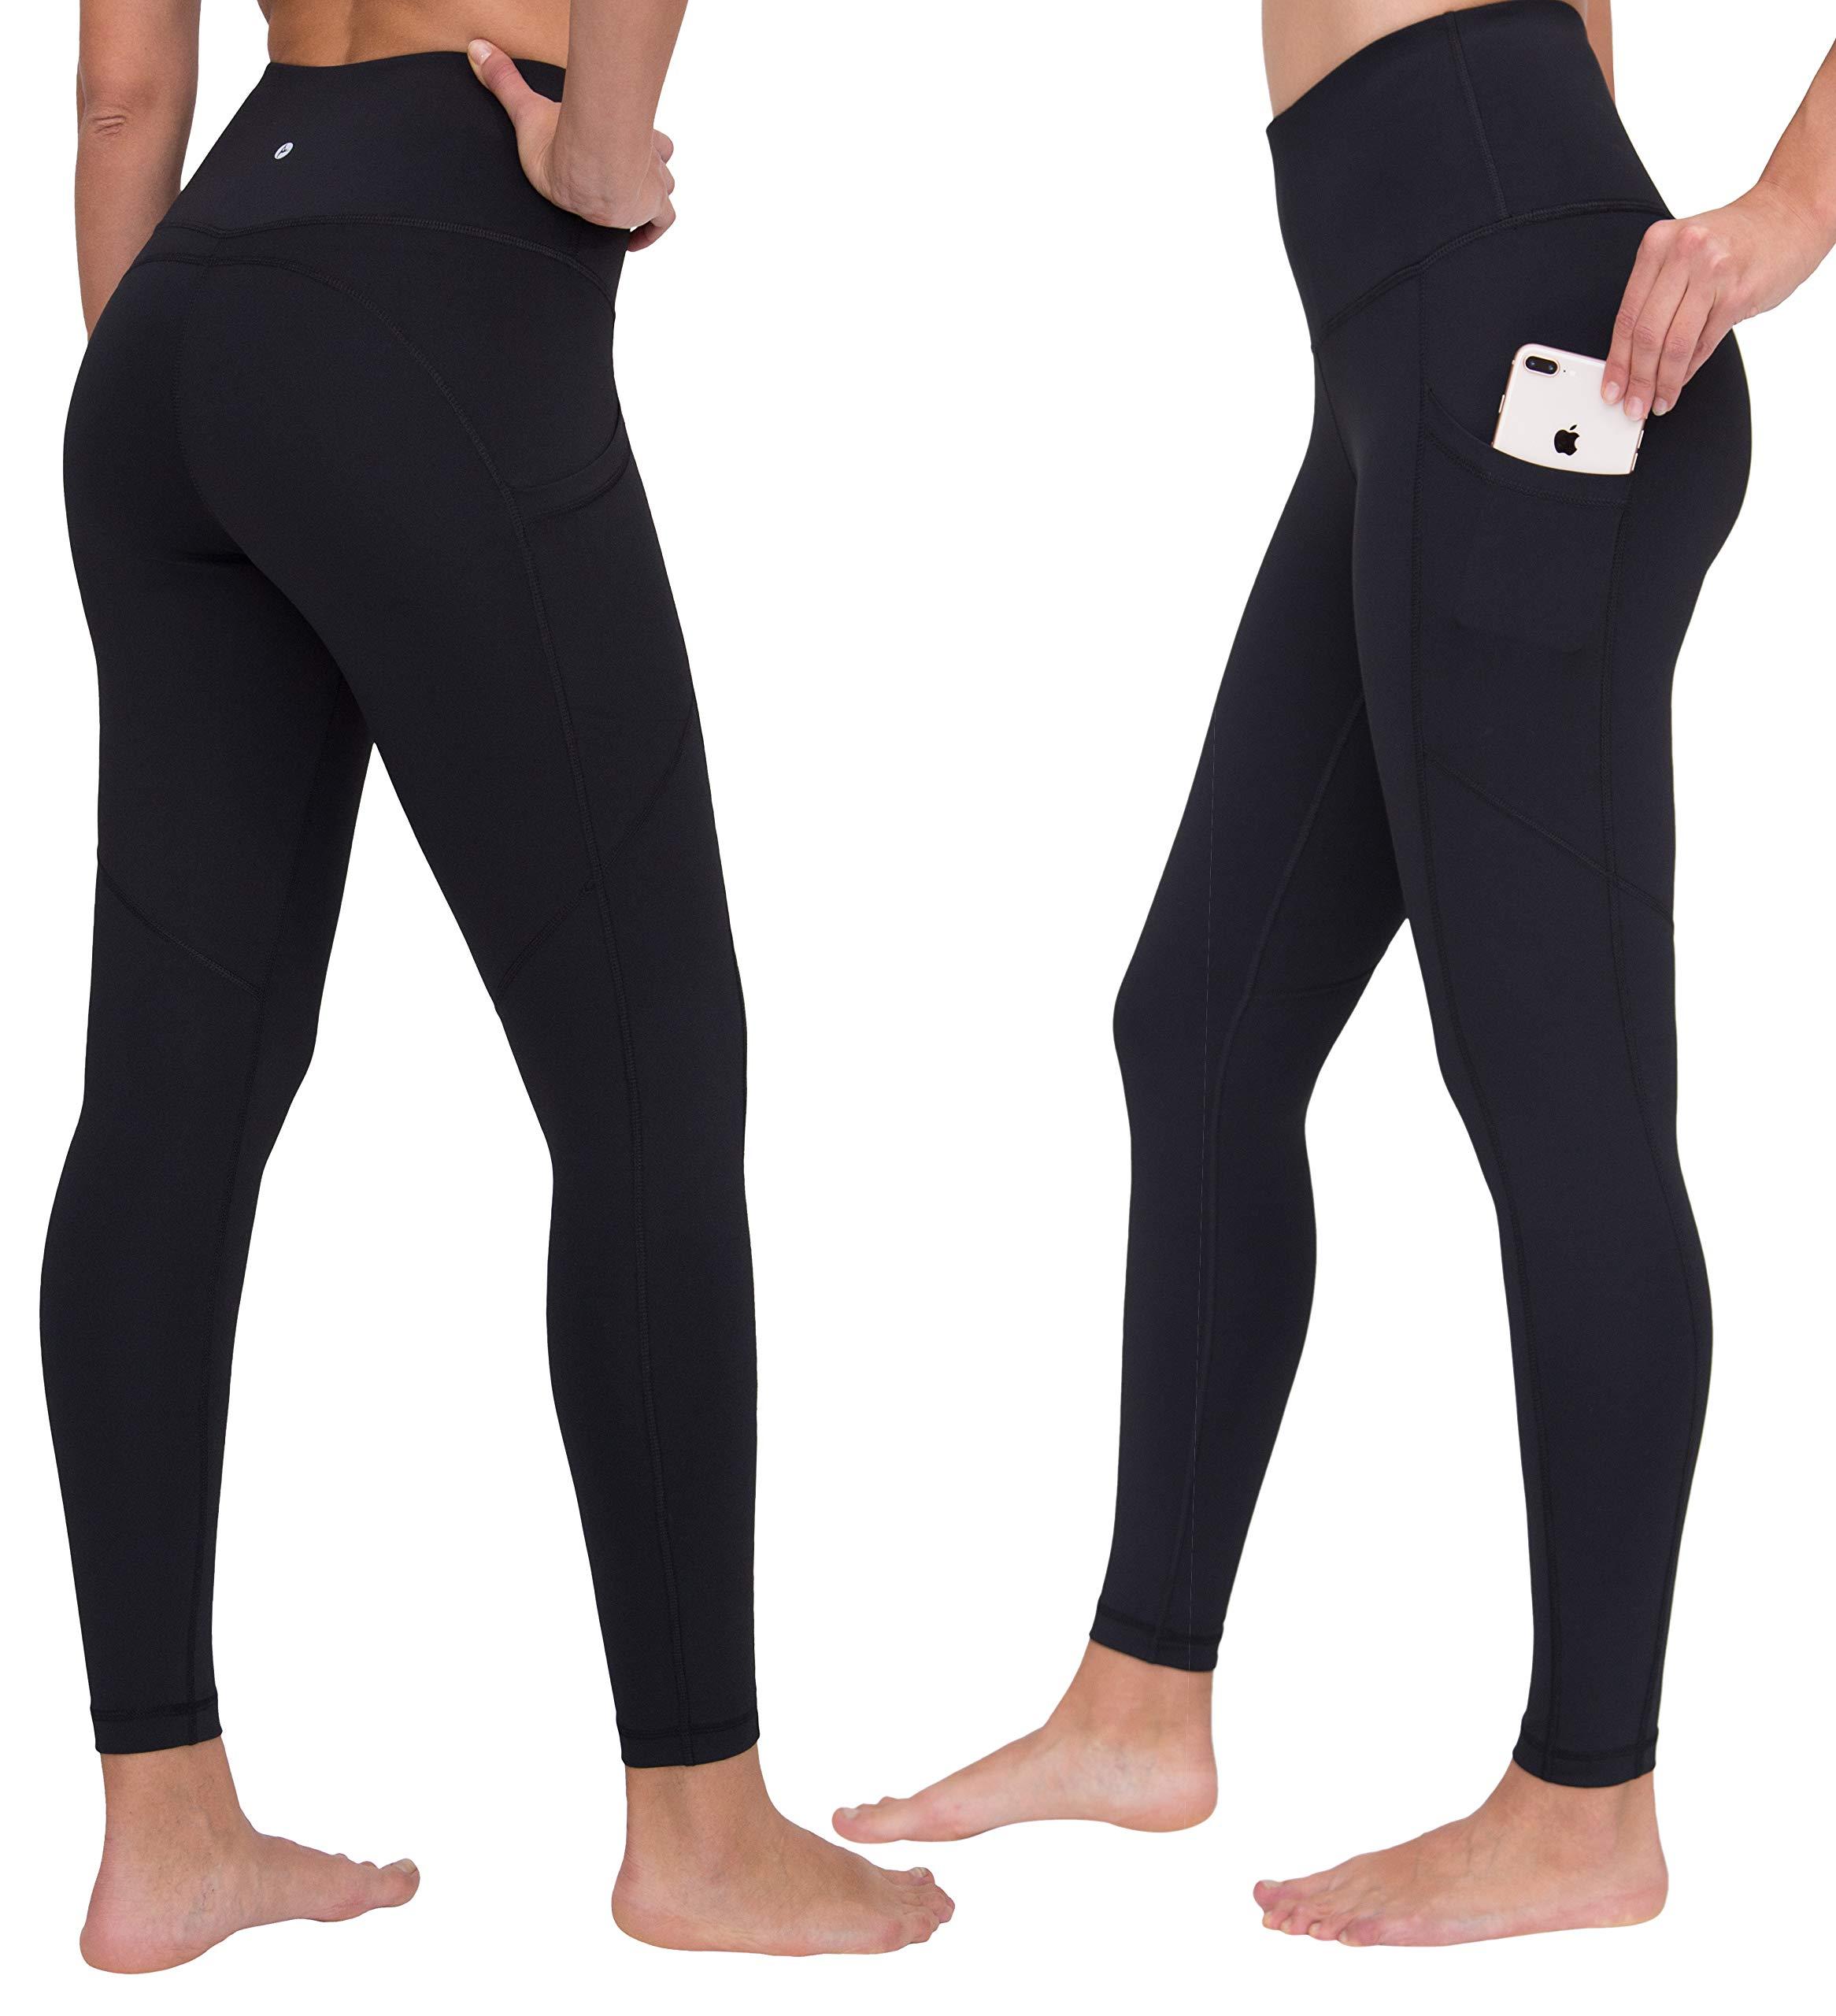 90 Degree By Reflex Women's Power Flex Yoga Pants - Black 2 Pack 2019 - Medium by 90 Degree By Reflex